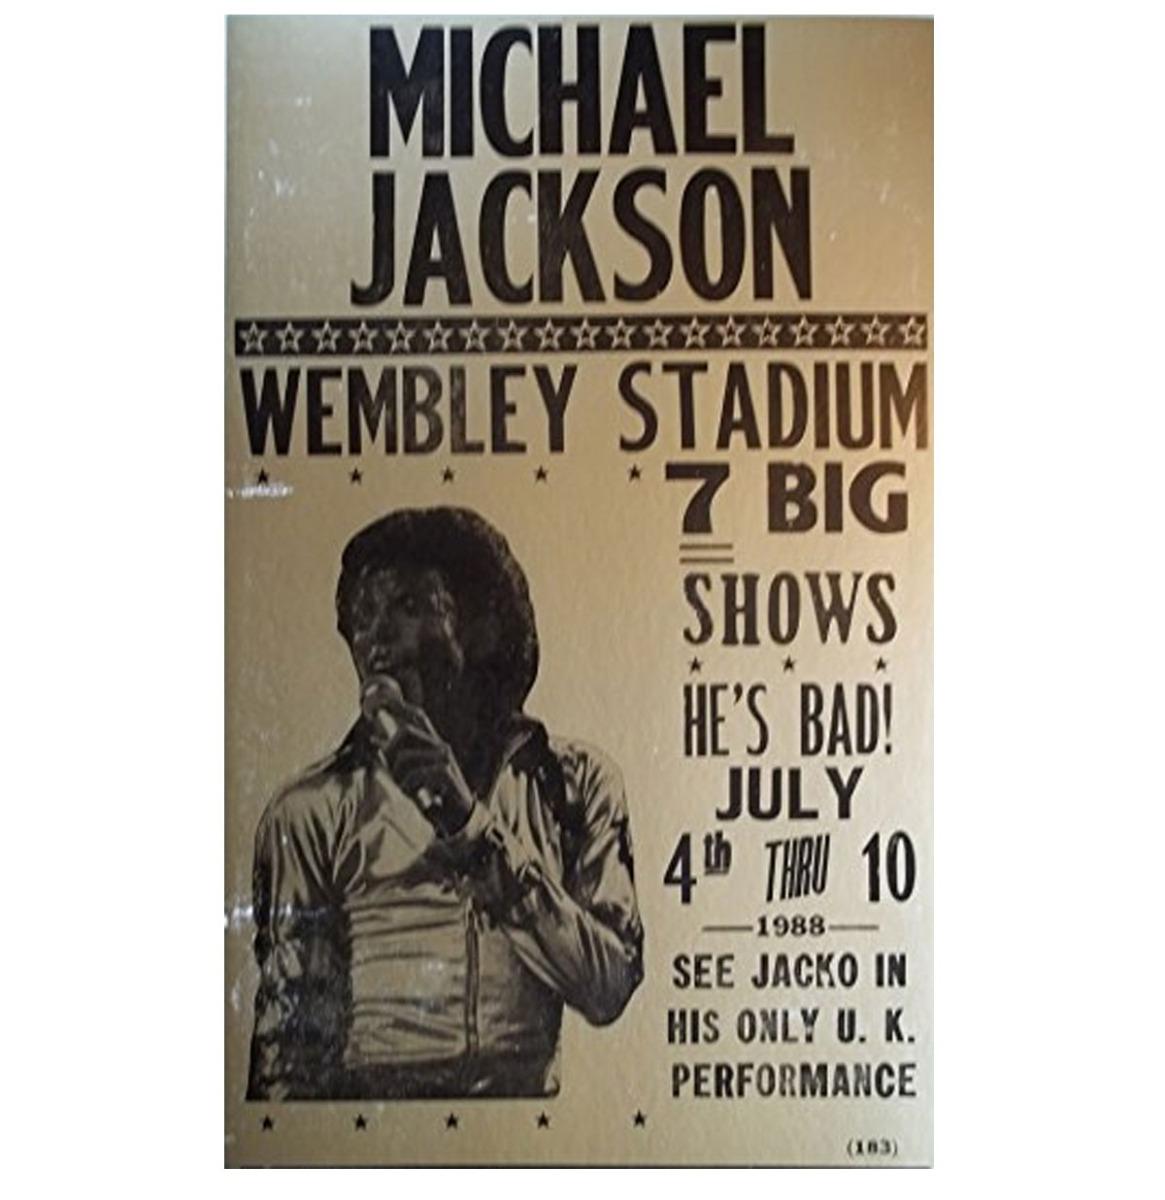 Michael Jackson Aankondigings Poster Wembley Stadium 4-10 July 1988